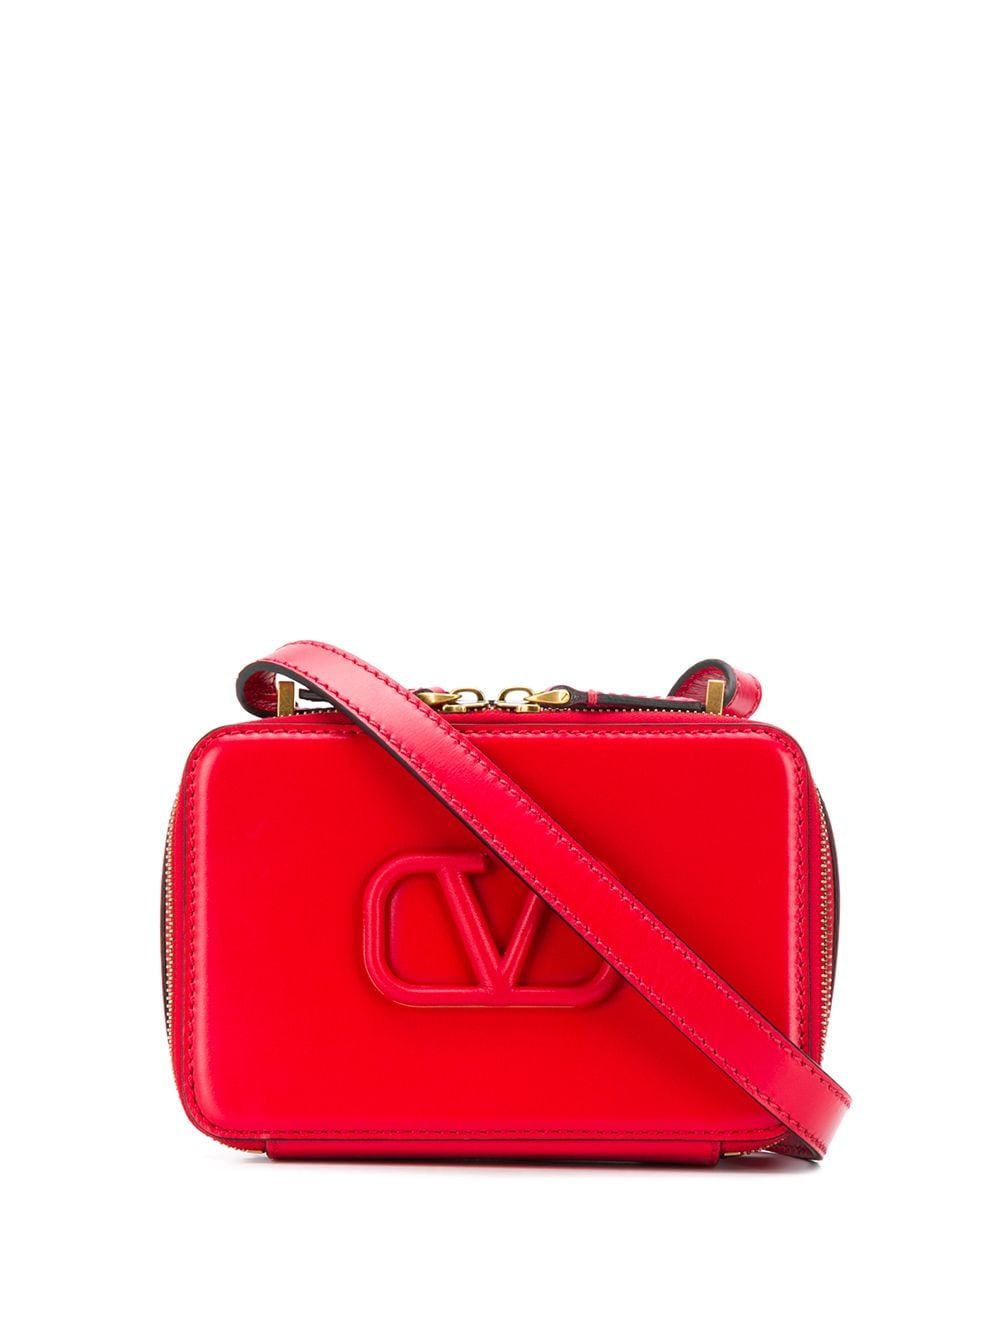 Vsling Small Leather Crossbody Bag